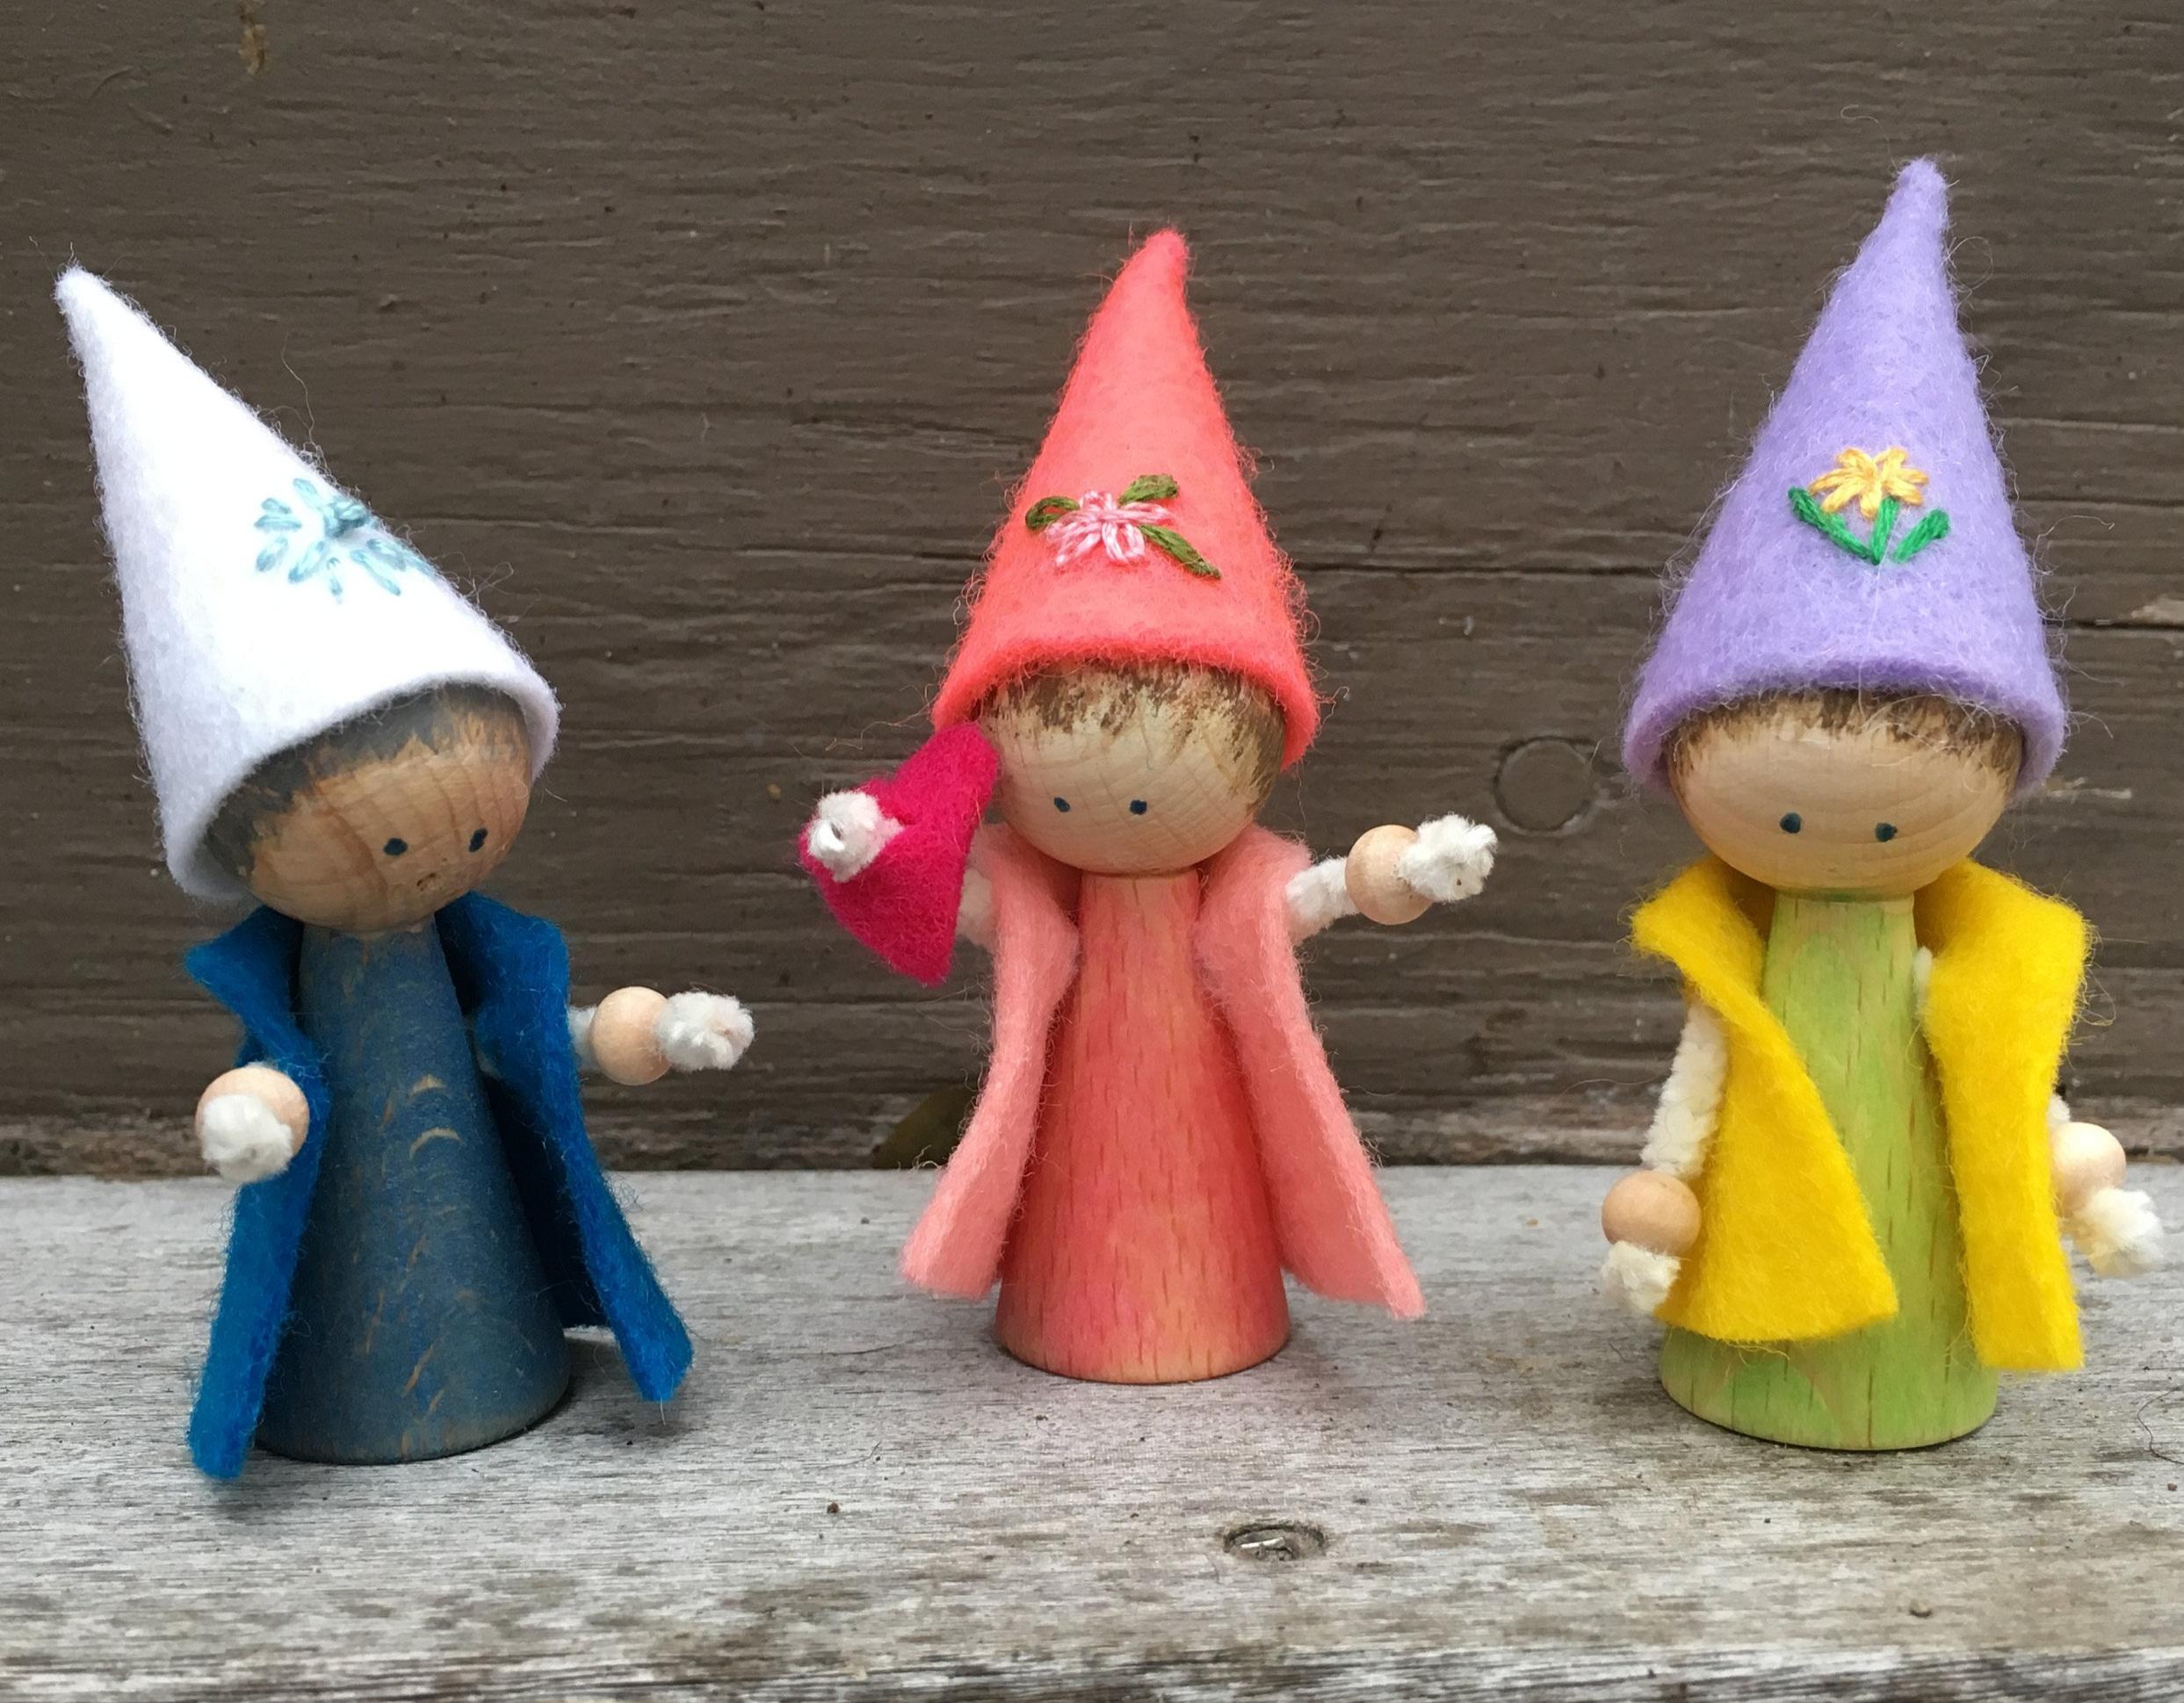 Peg Gnomes: Snowflake, Valentine and Dandelion